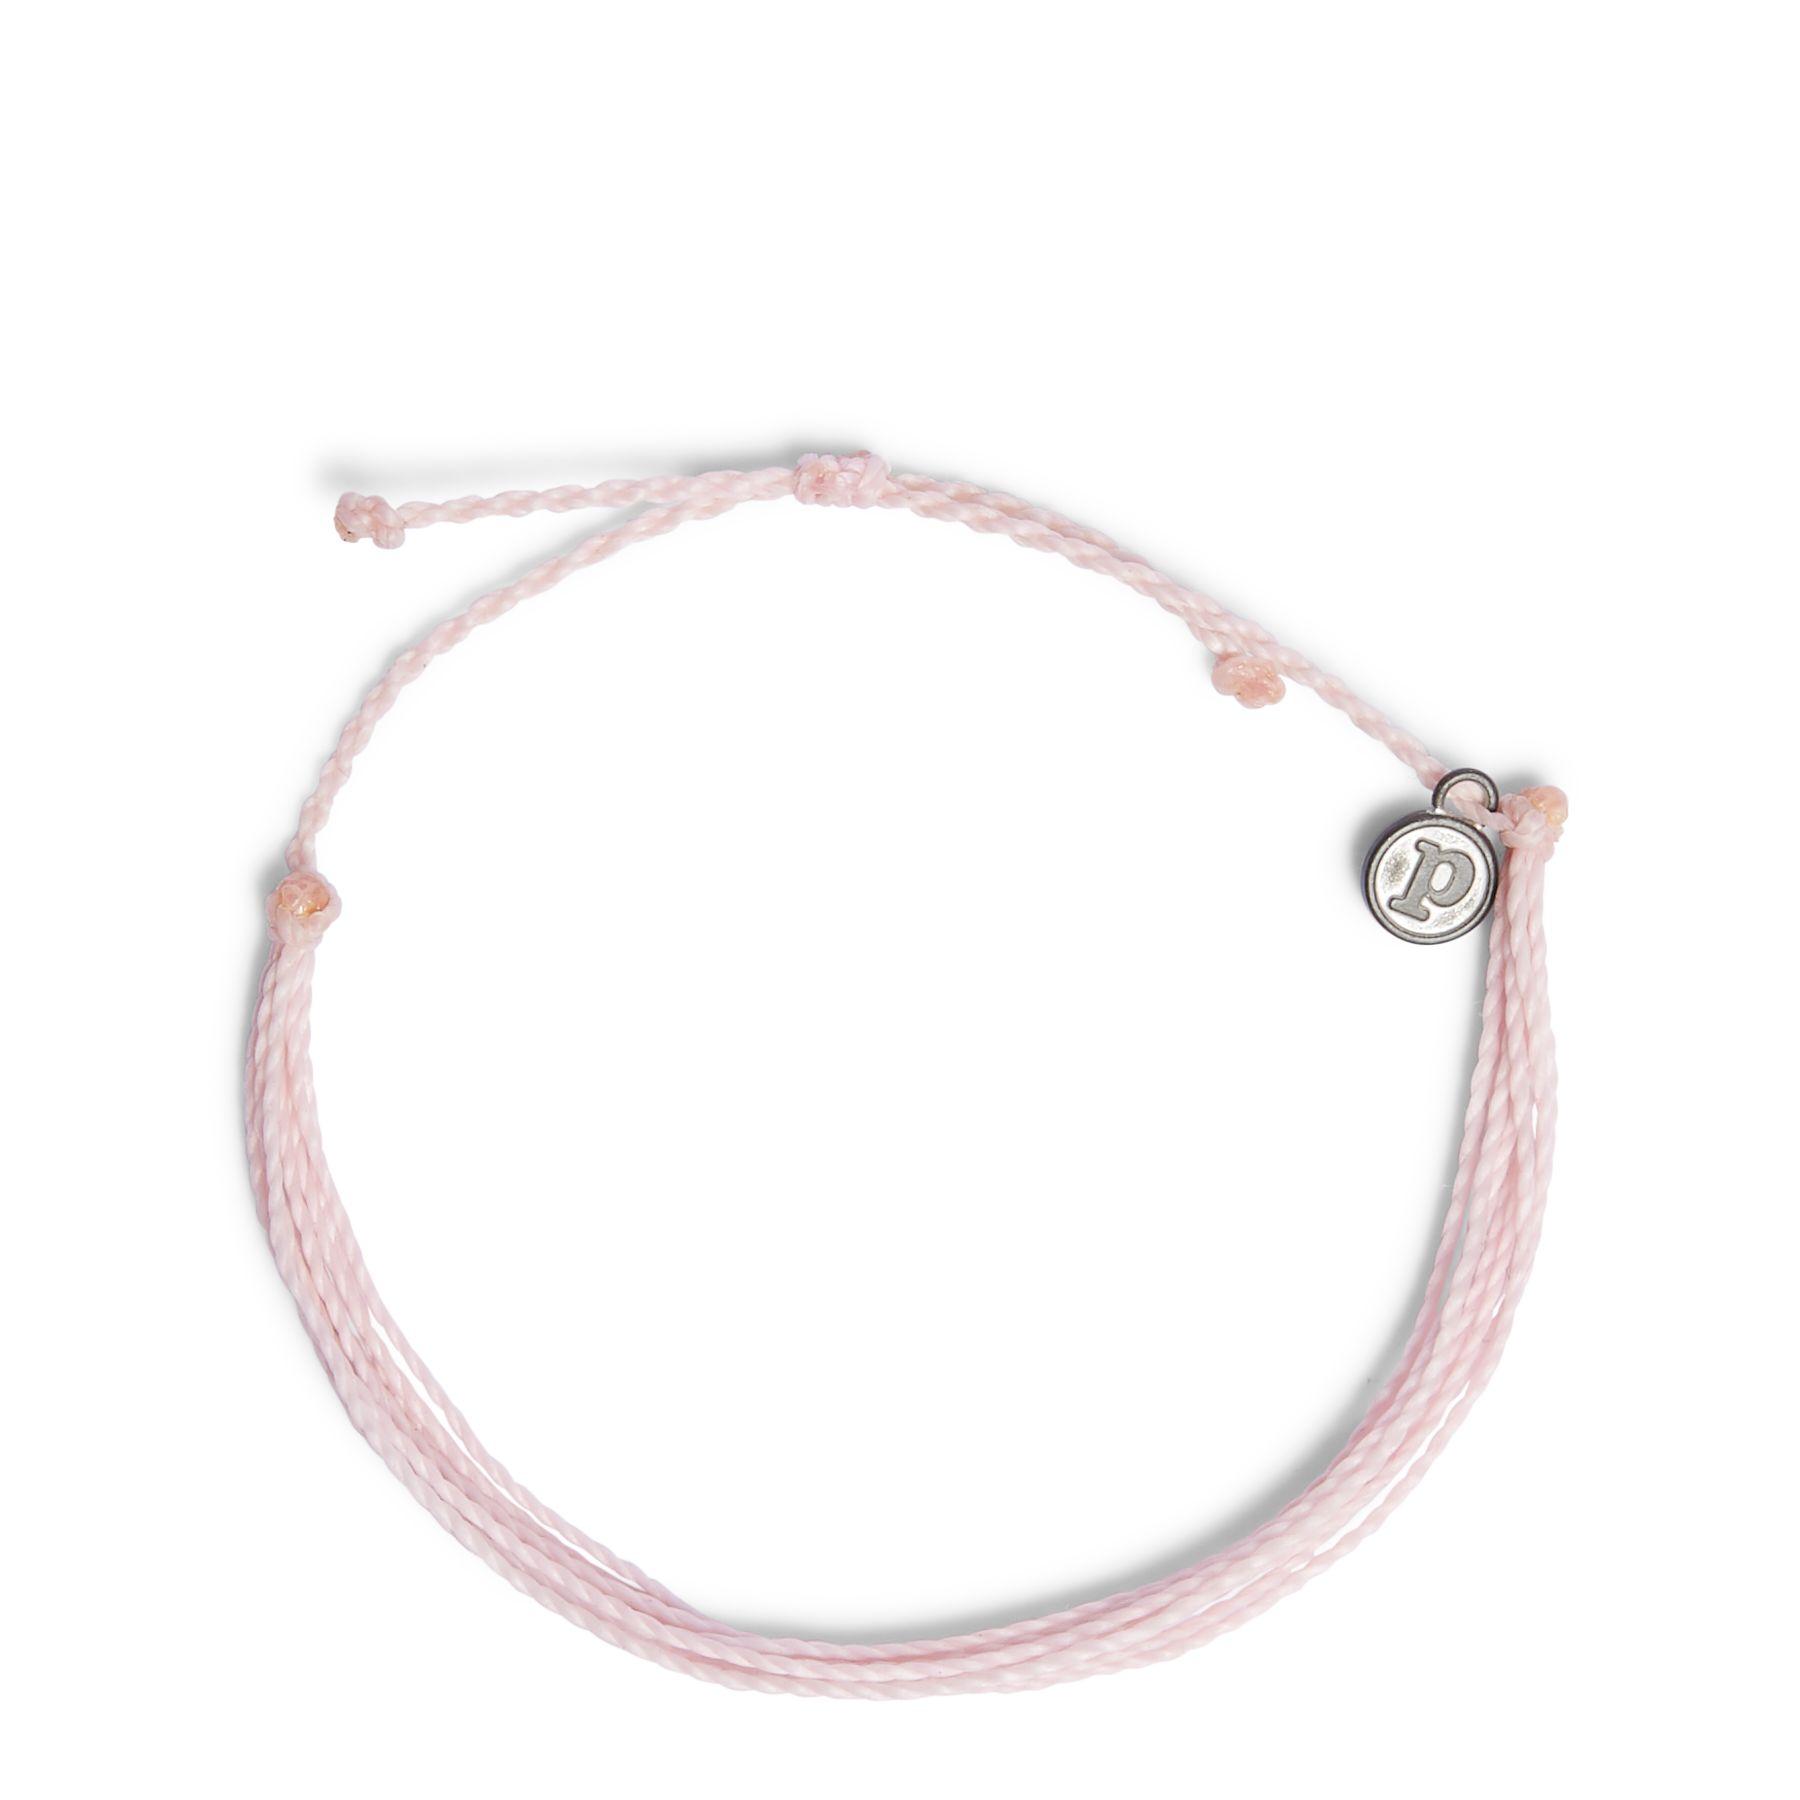 Pura Vida Bracelet for Vera Bradley Foundation